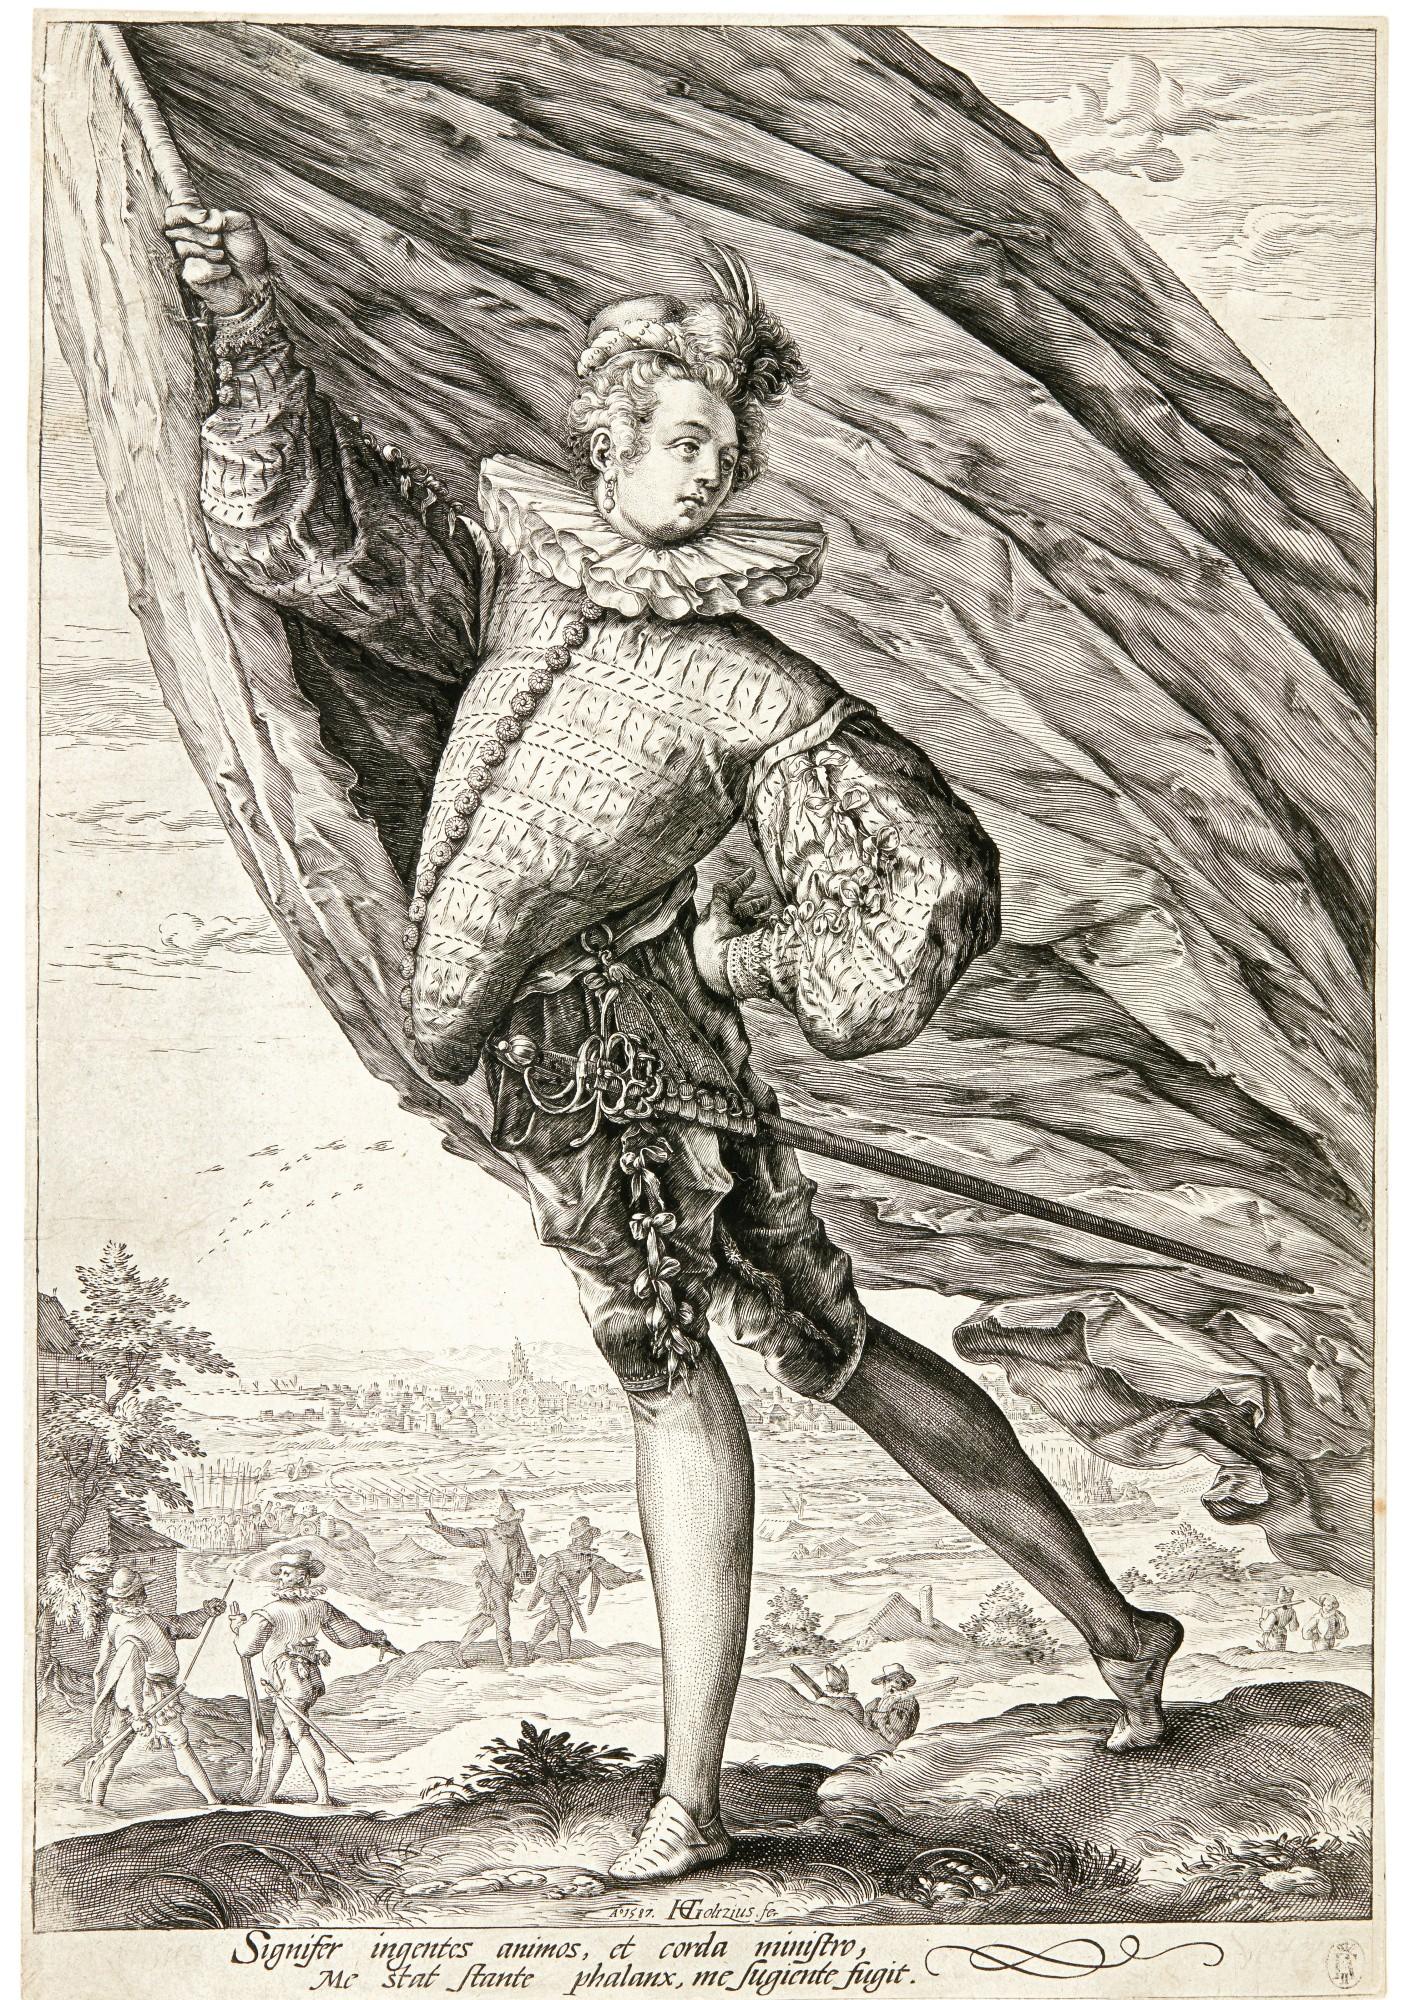 HENDRICK GOLTZIUS   THE GREAT STANDARD-BEARER (B. 125; HOLL. 255; NEW HOLL. 288; S. 253)